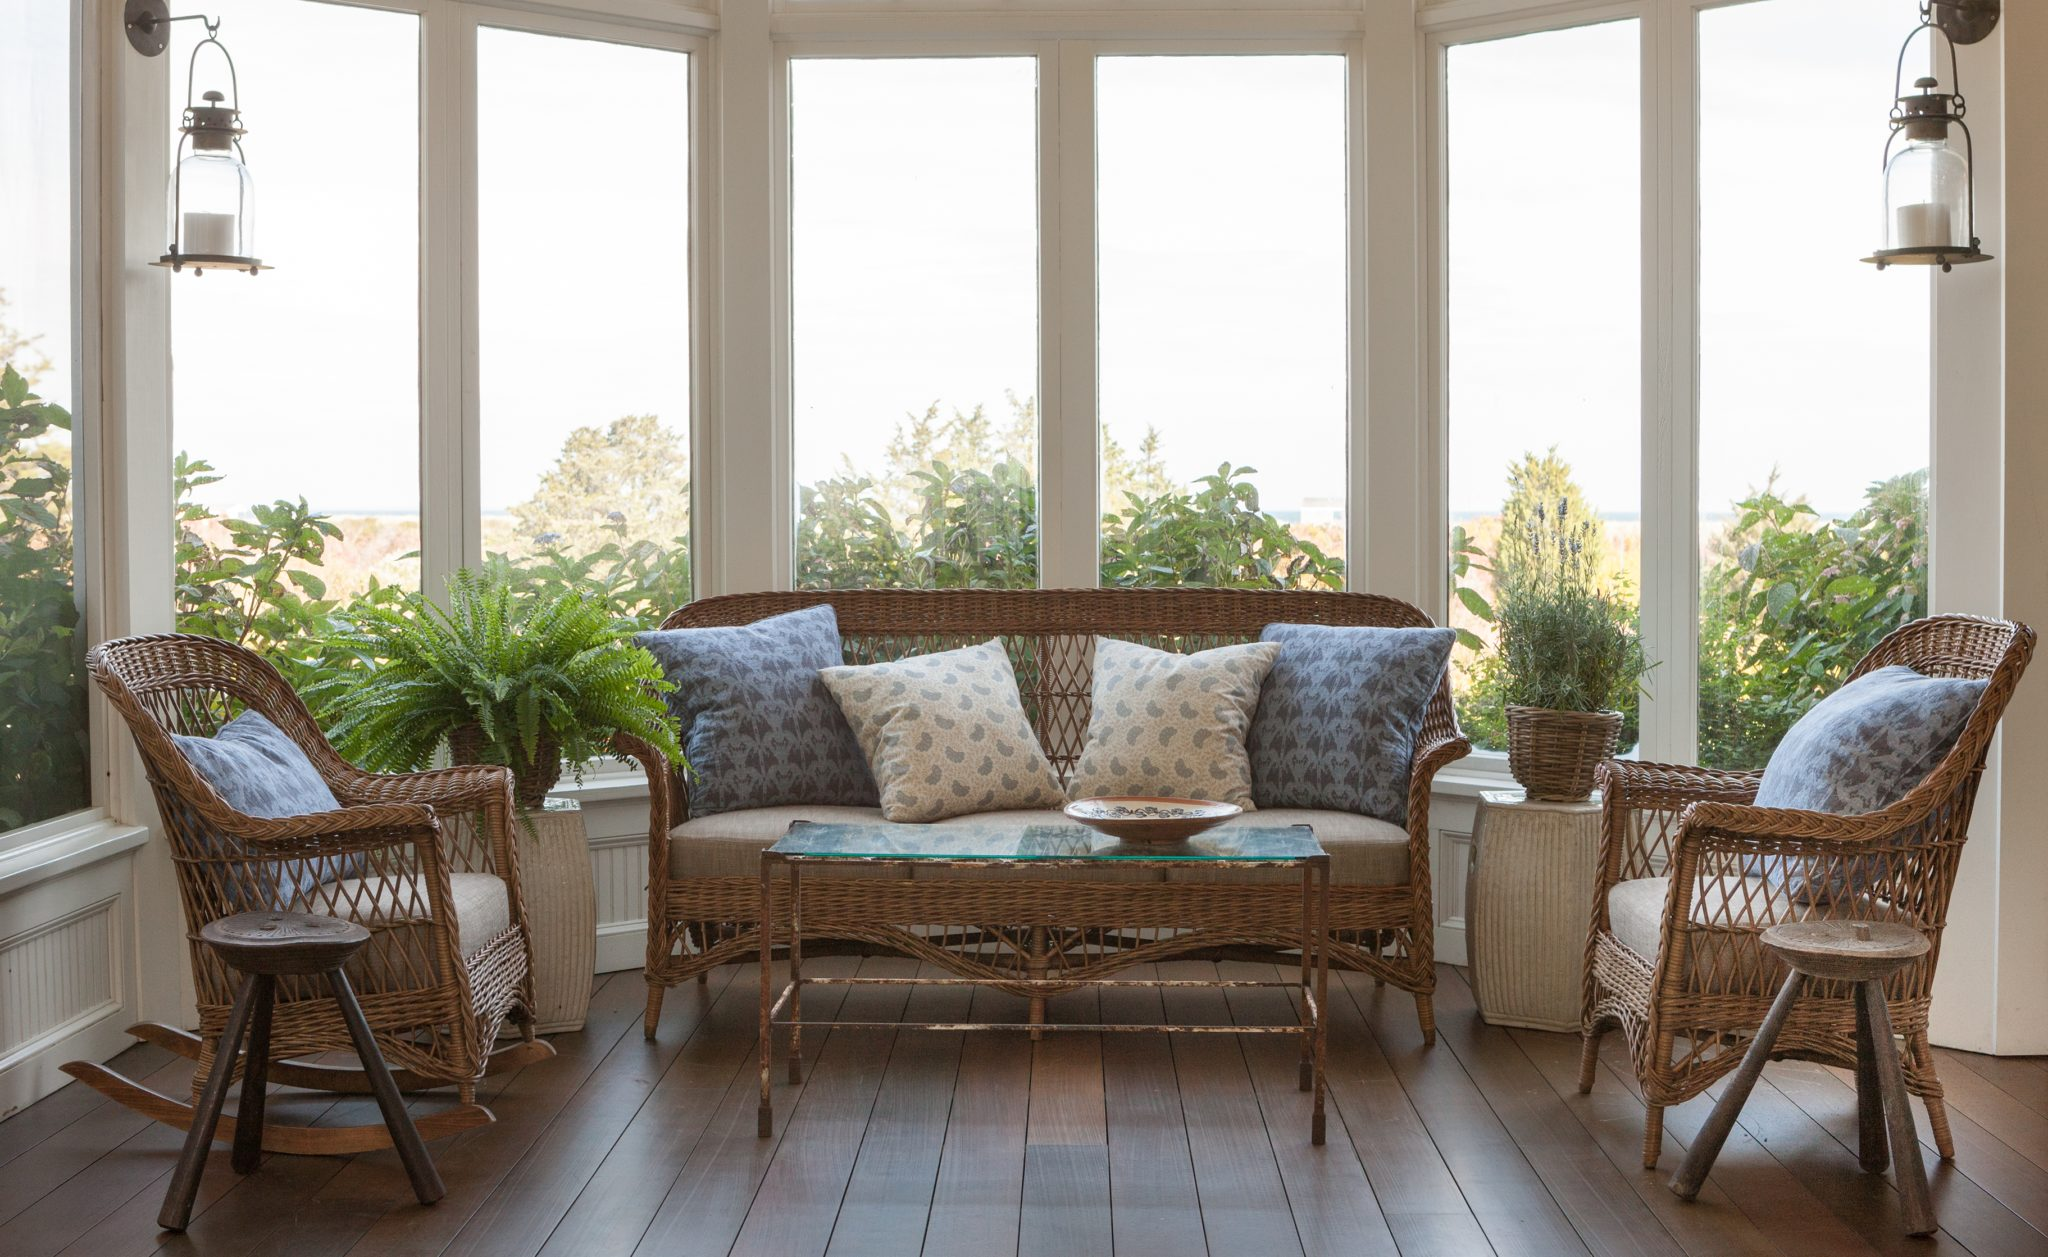 Interior design byLiliane Hart Interiors